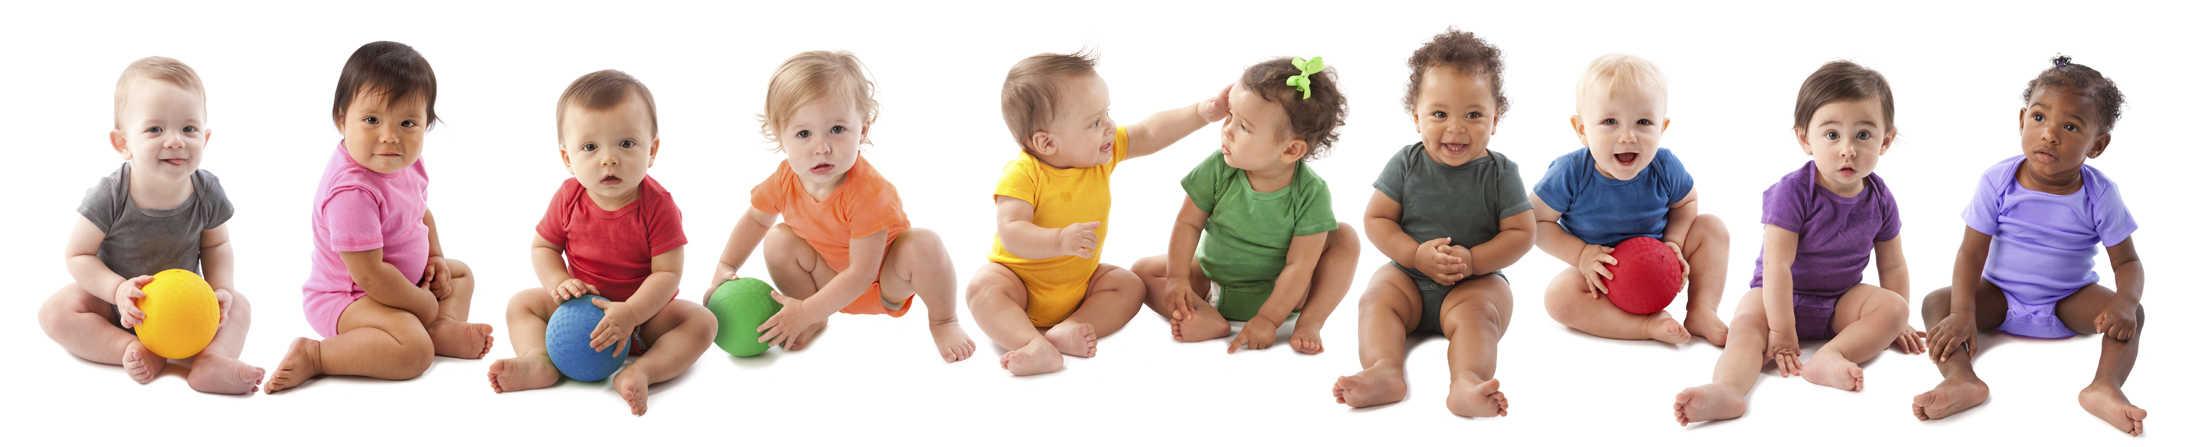 nhf multi ethnicity babies